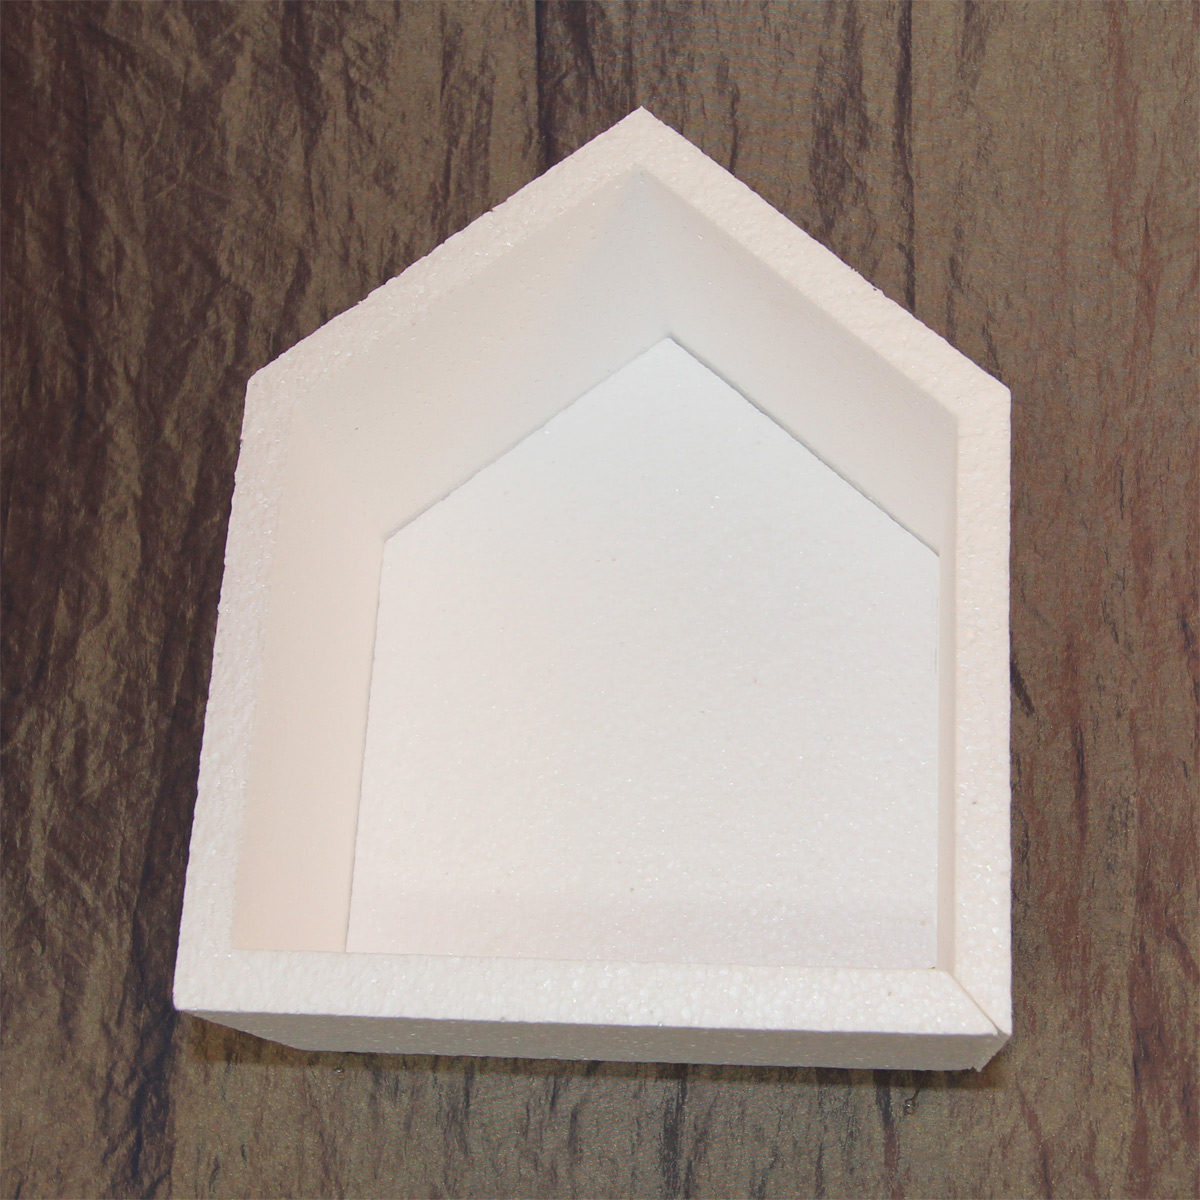 коробка из пенопласта